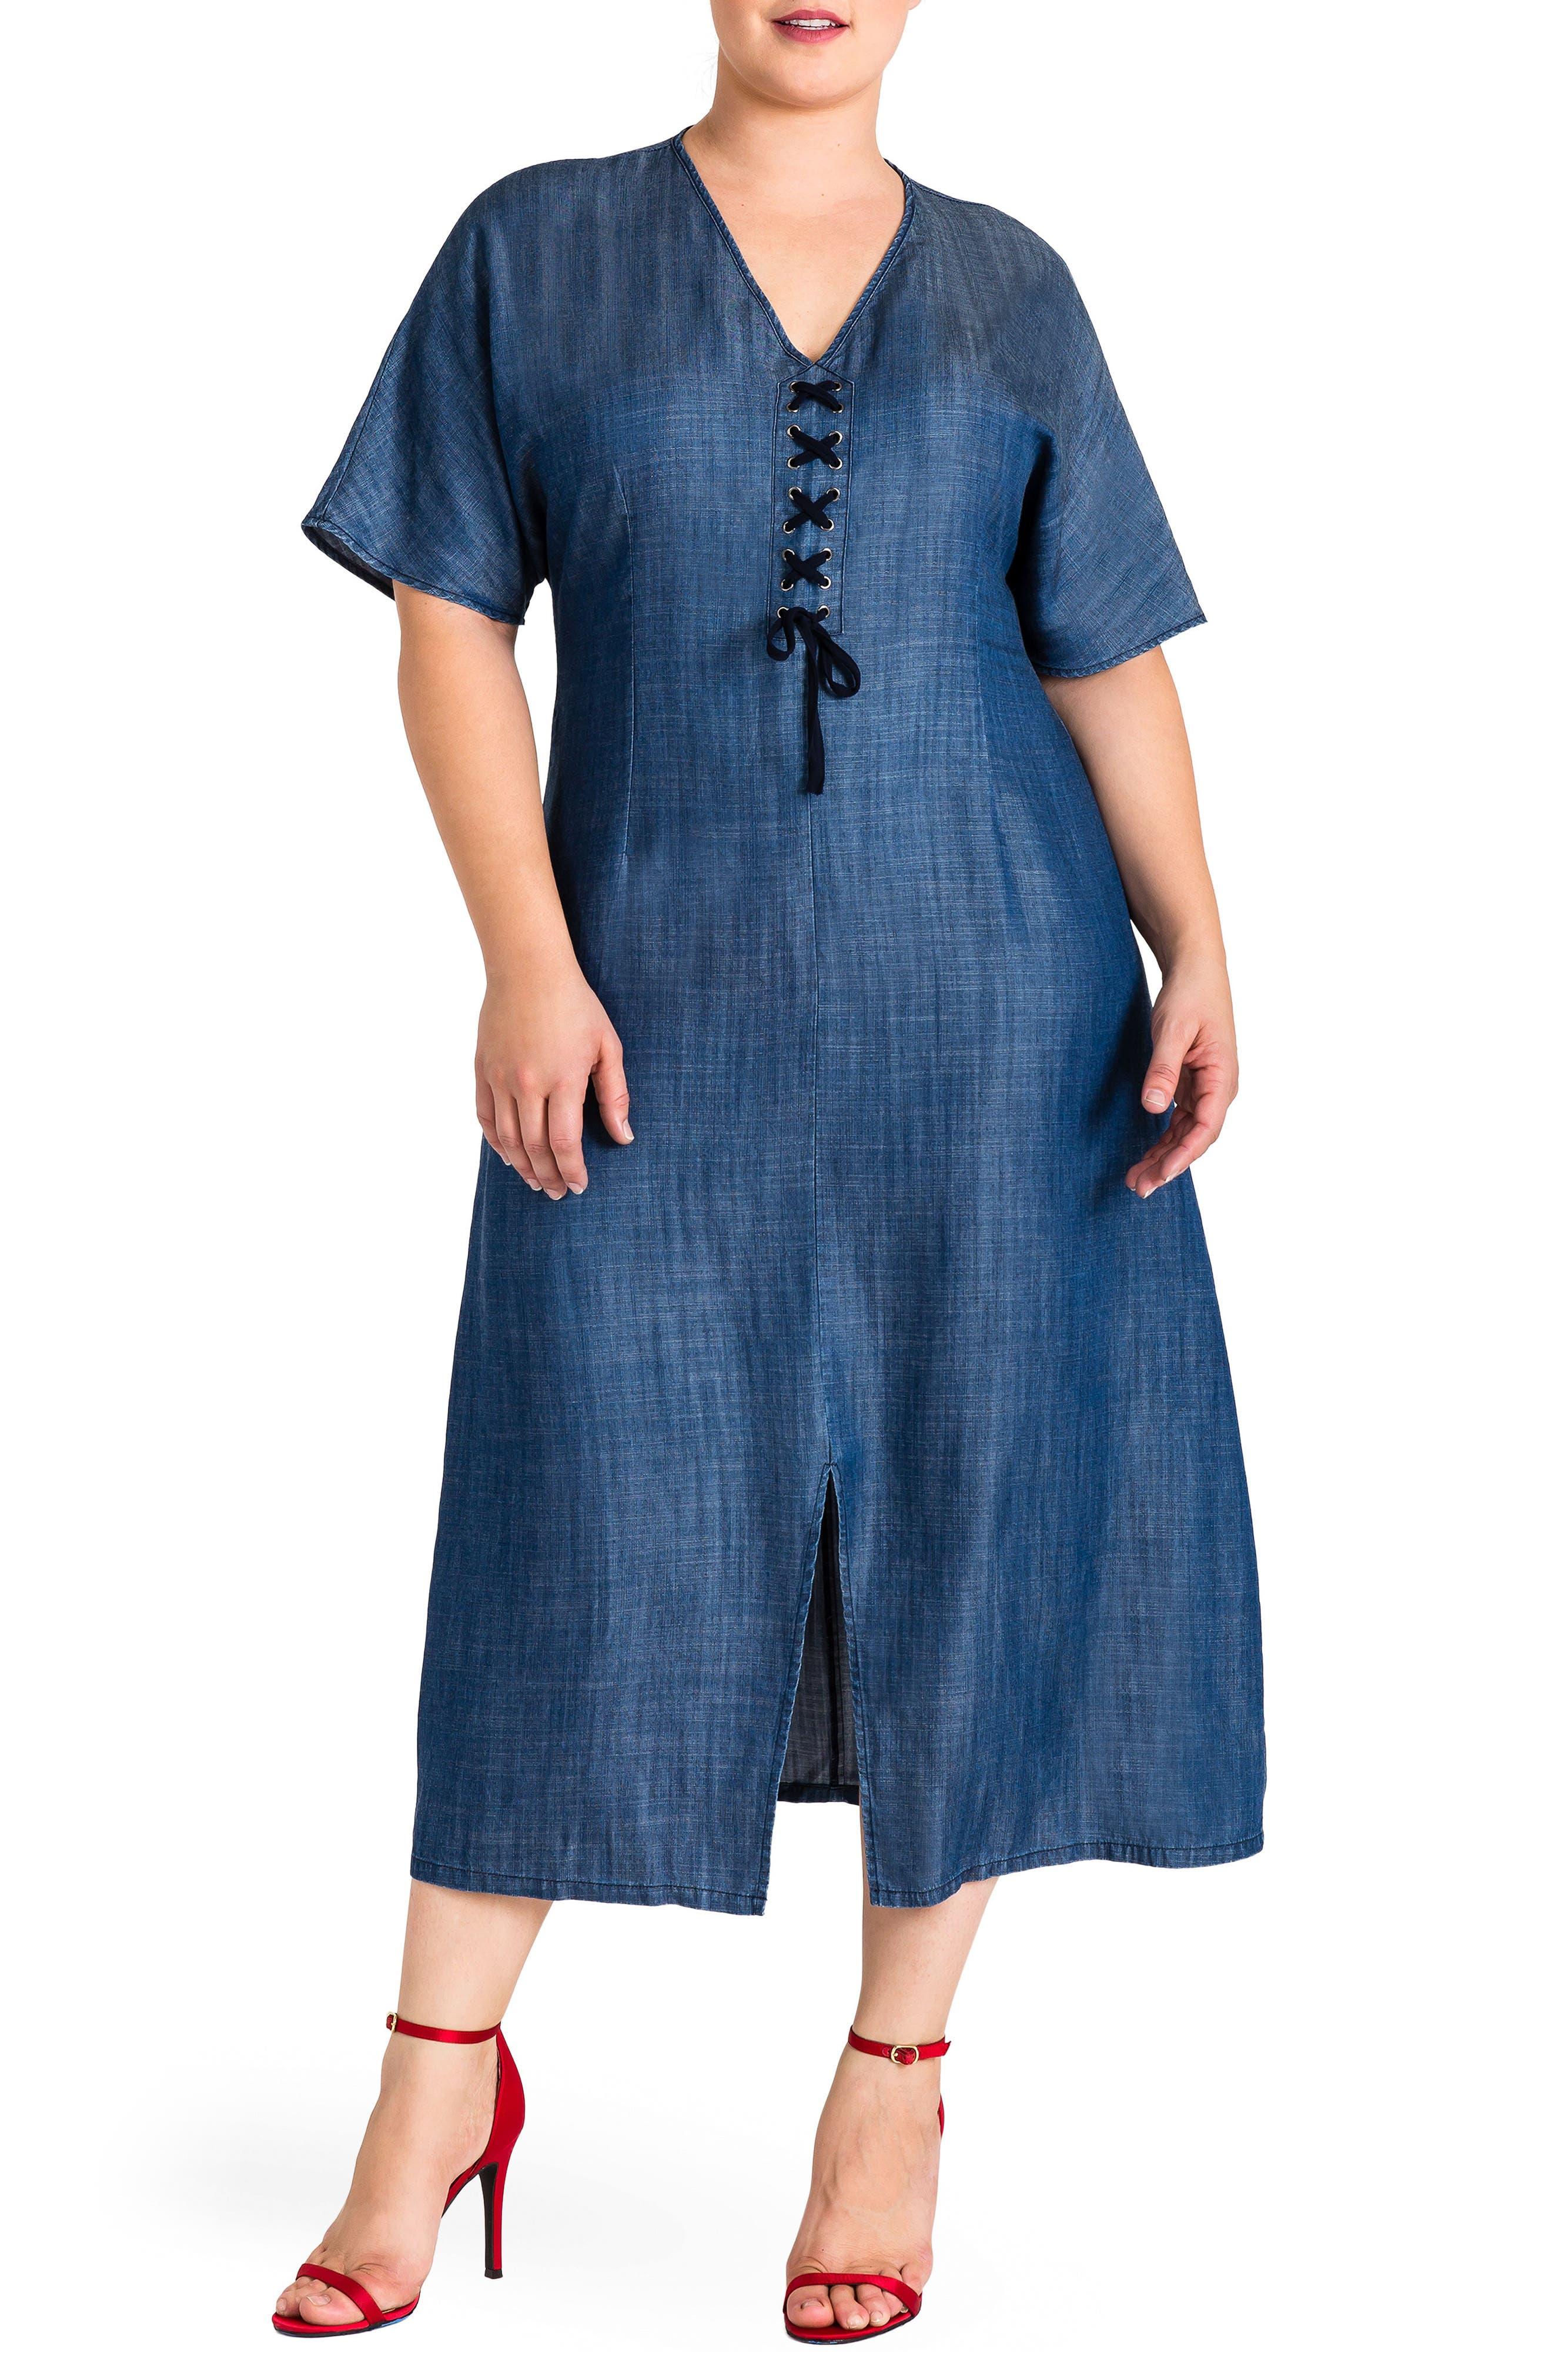 plus size women's standard & practices meme tencel midi dress